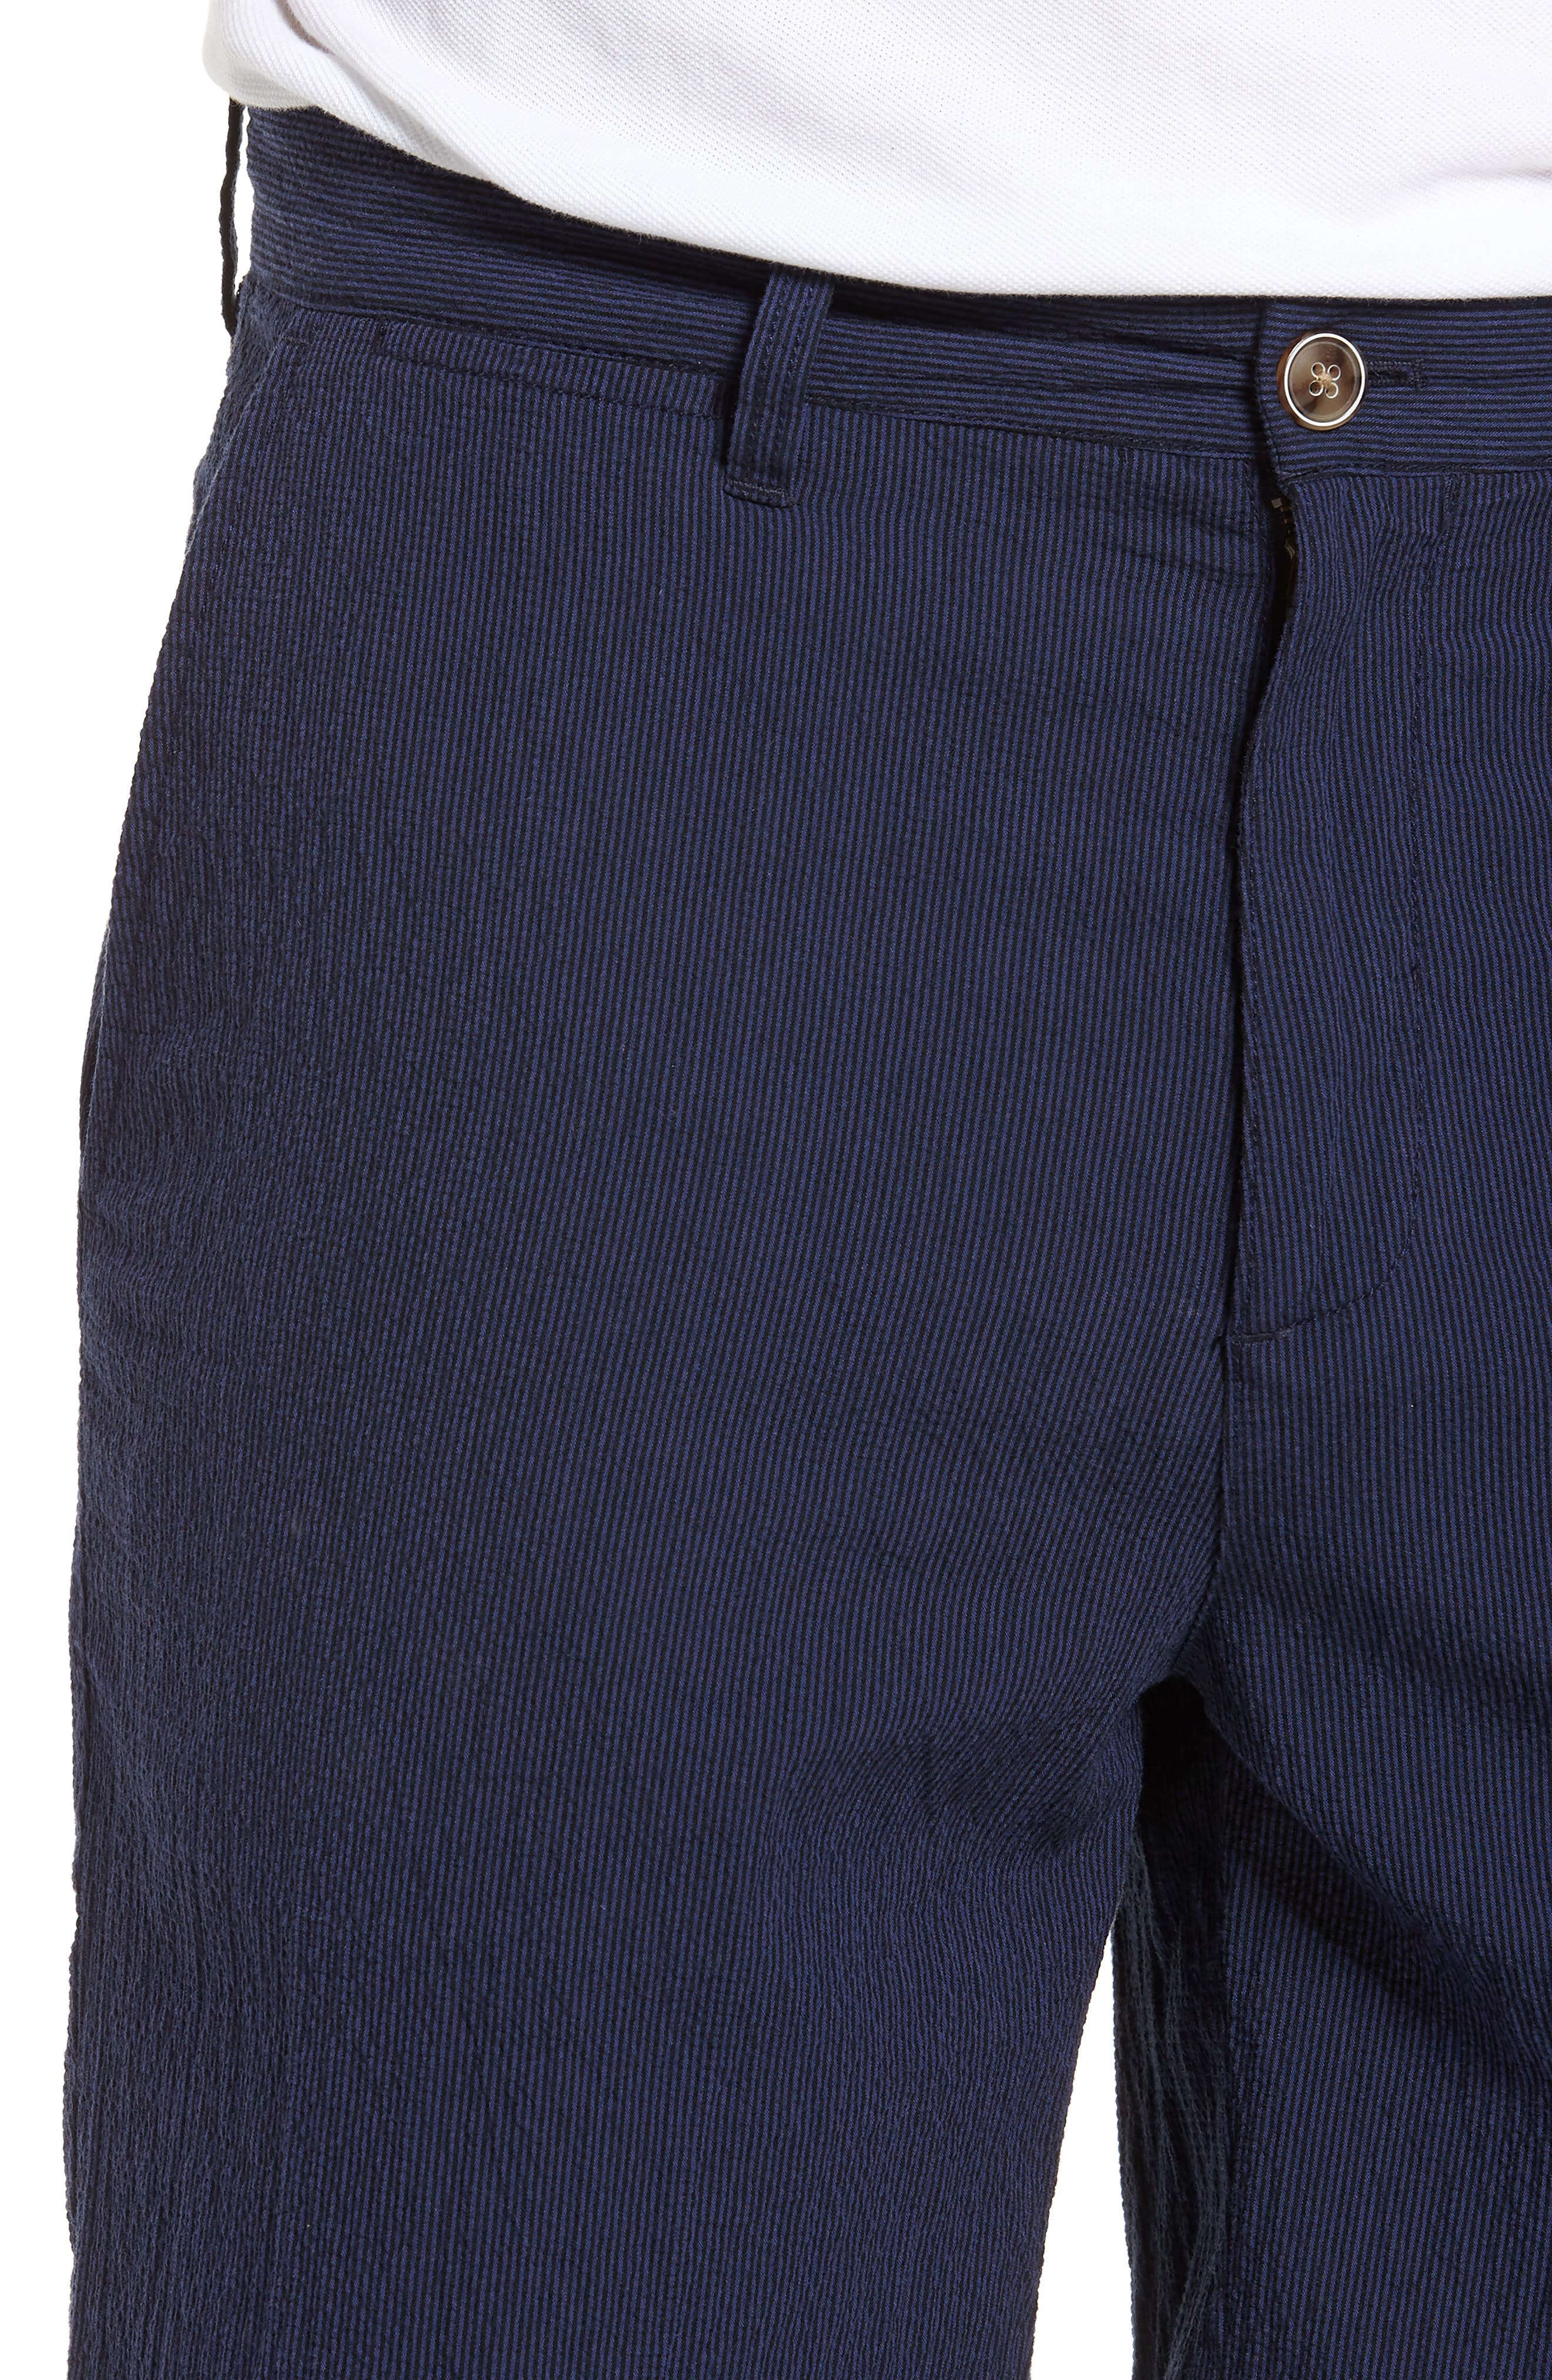 Bryson Regular Fit Shorts,                             Alternate thumbnail 4, color,                             Ripple